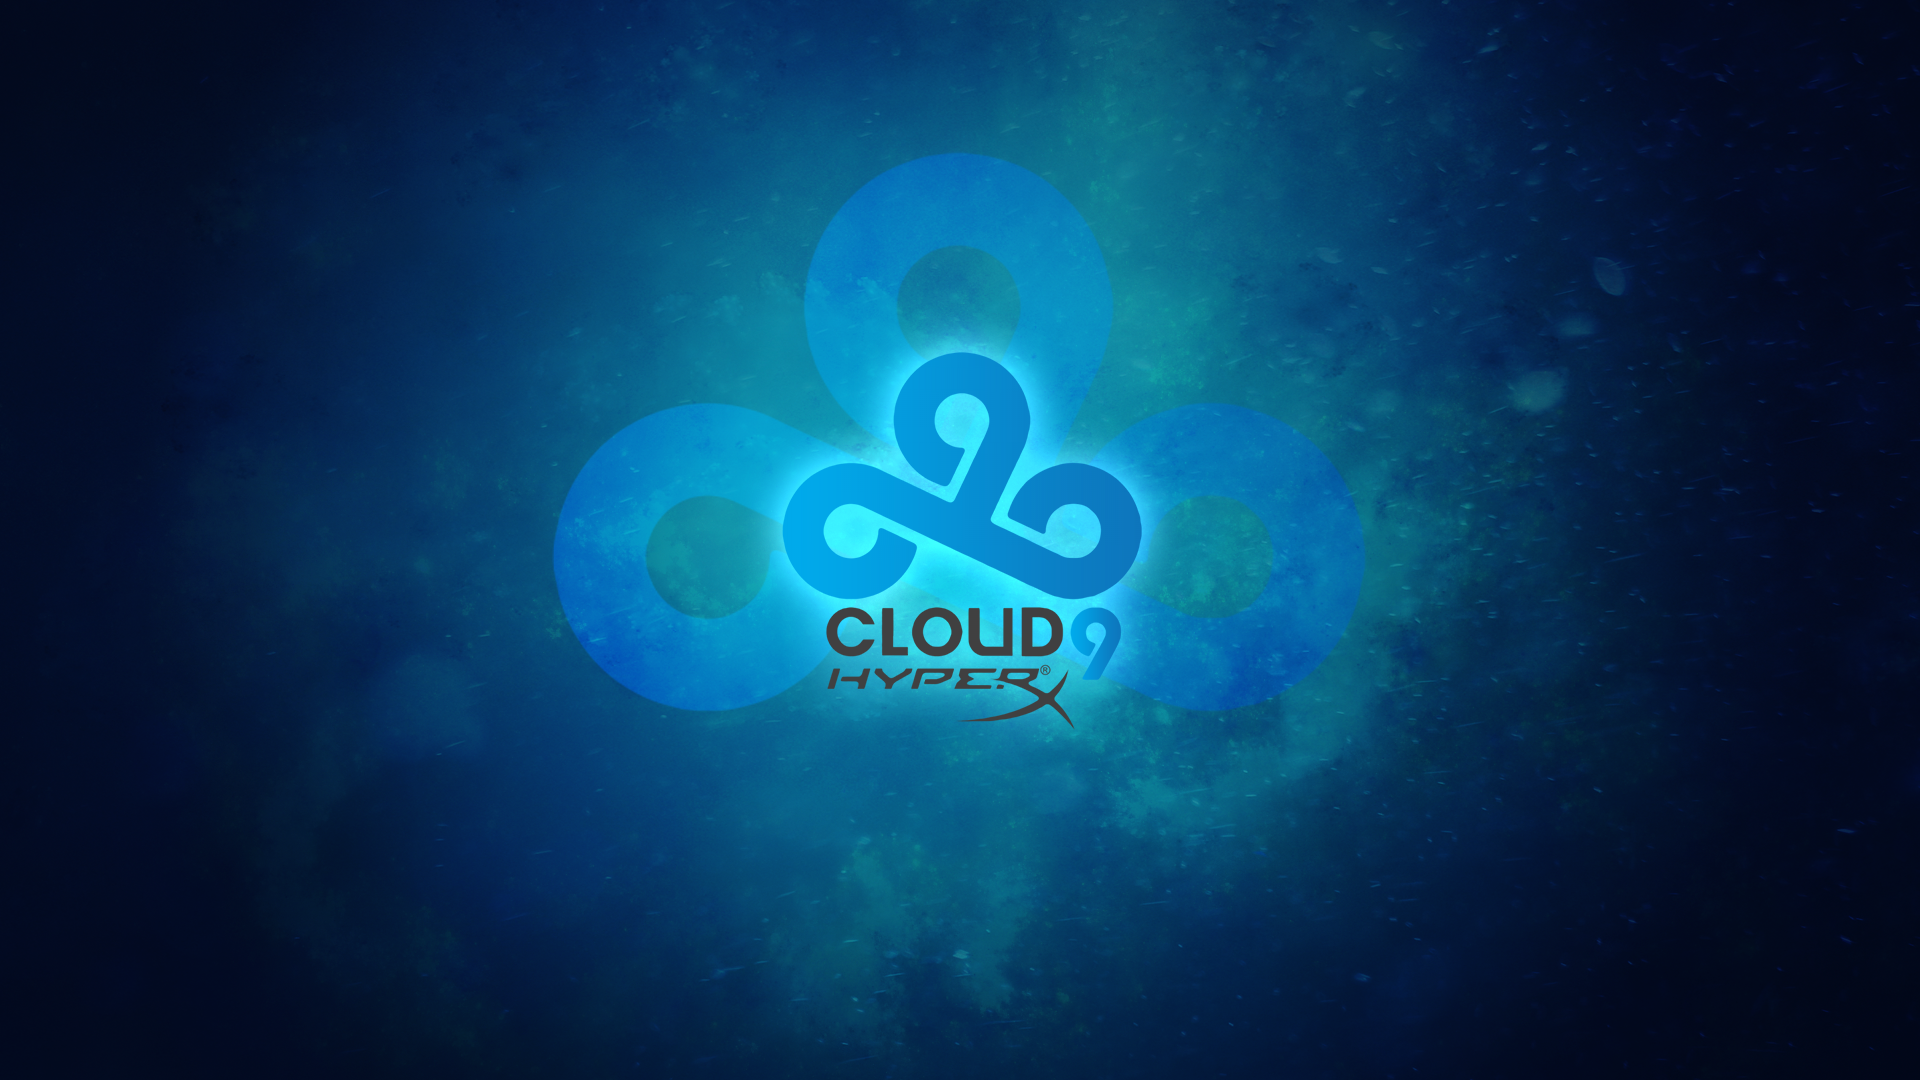 cloud 9 wallpaper by nervyzombie customization wallpaper hdtv 1920x1080